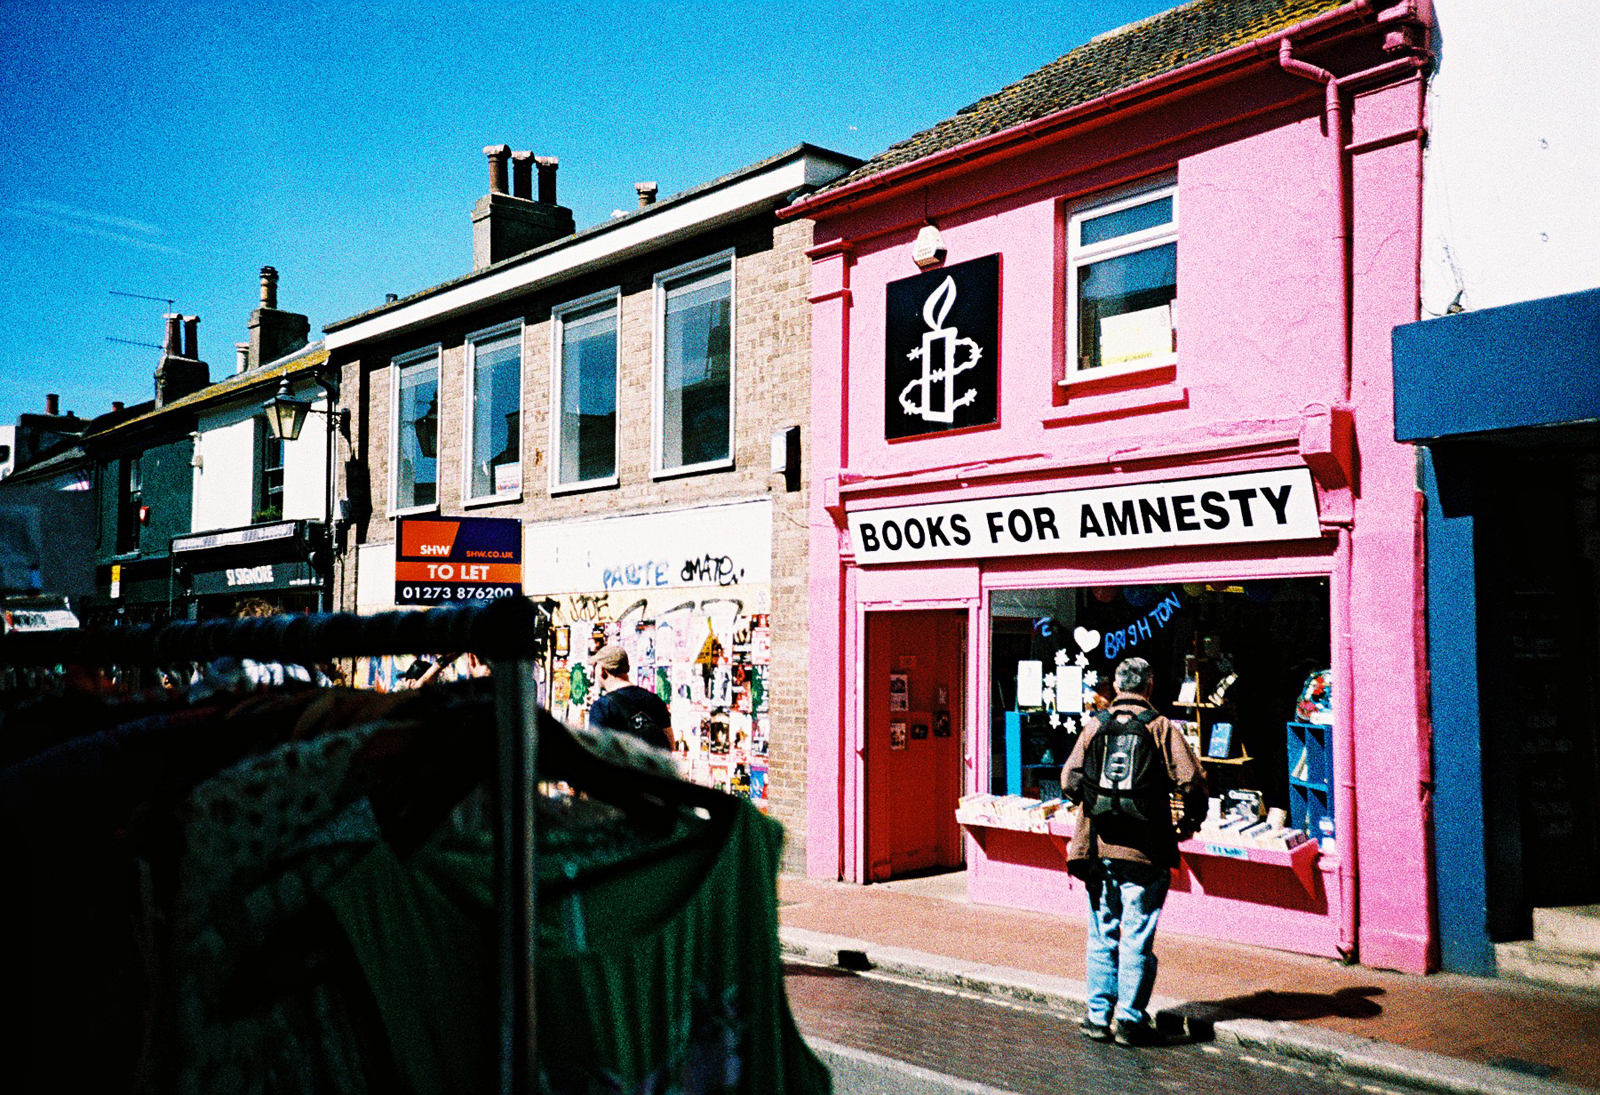 Brighton shopfront and clothes